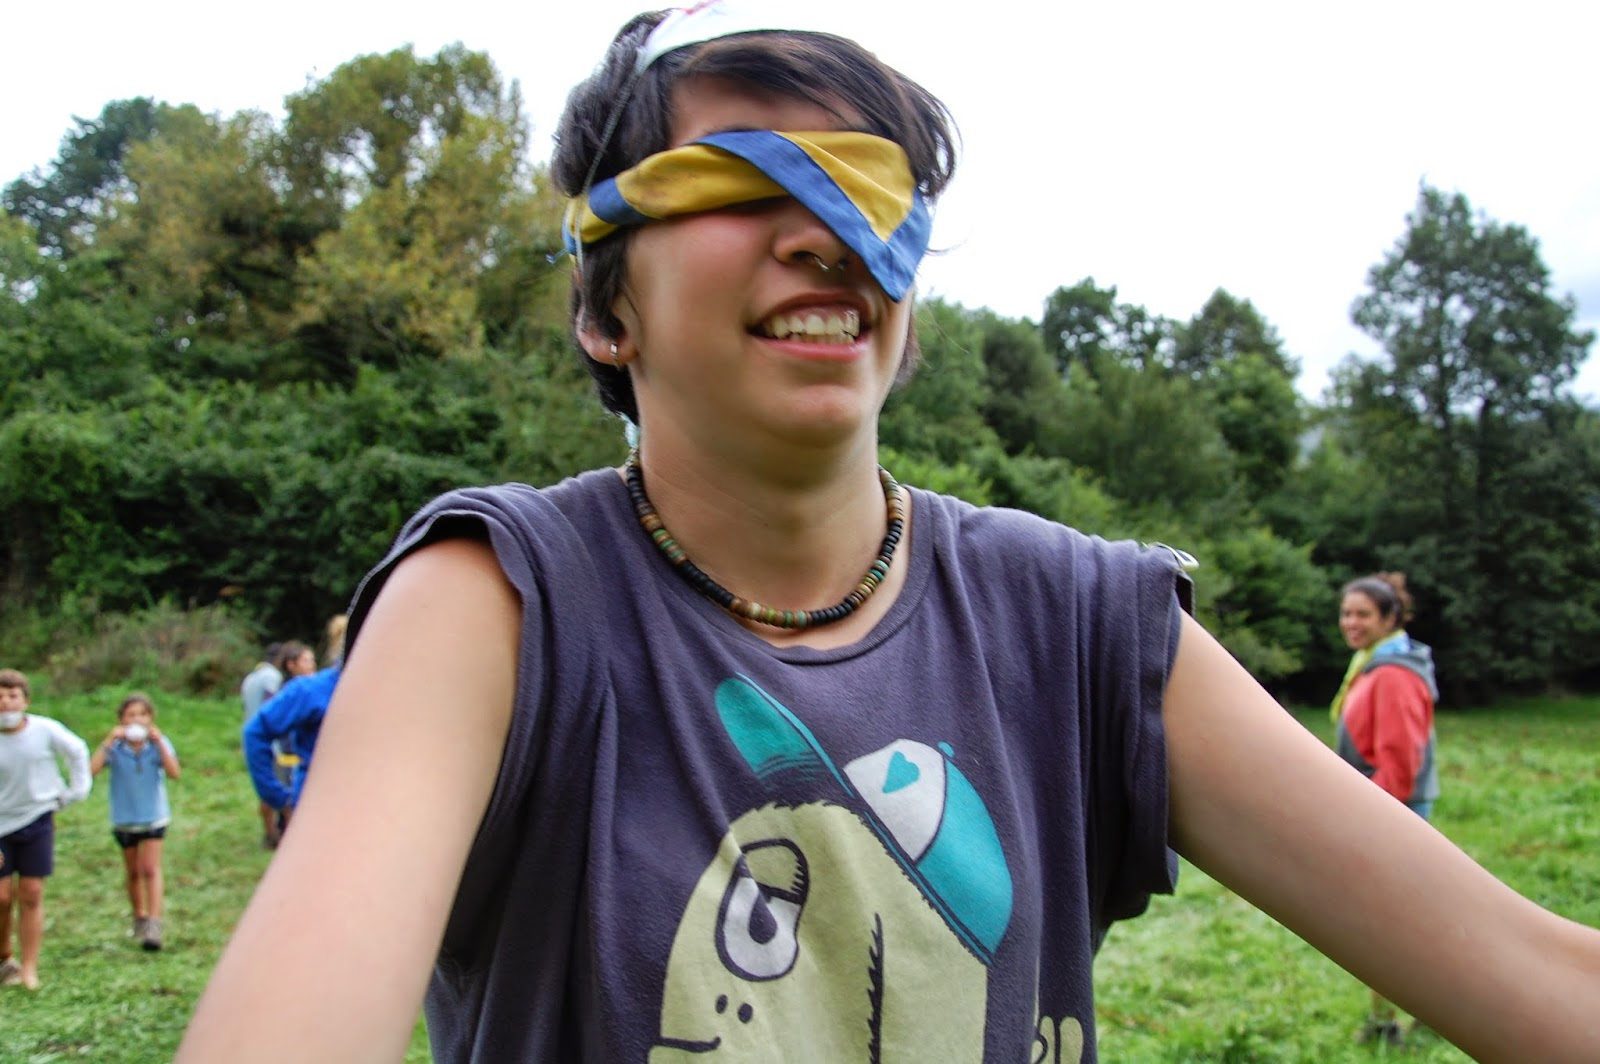 Campaments Estiu RolandKing 2011 - DSC_0199%2B2.JPG